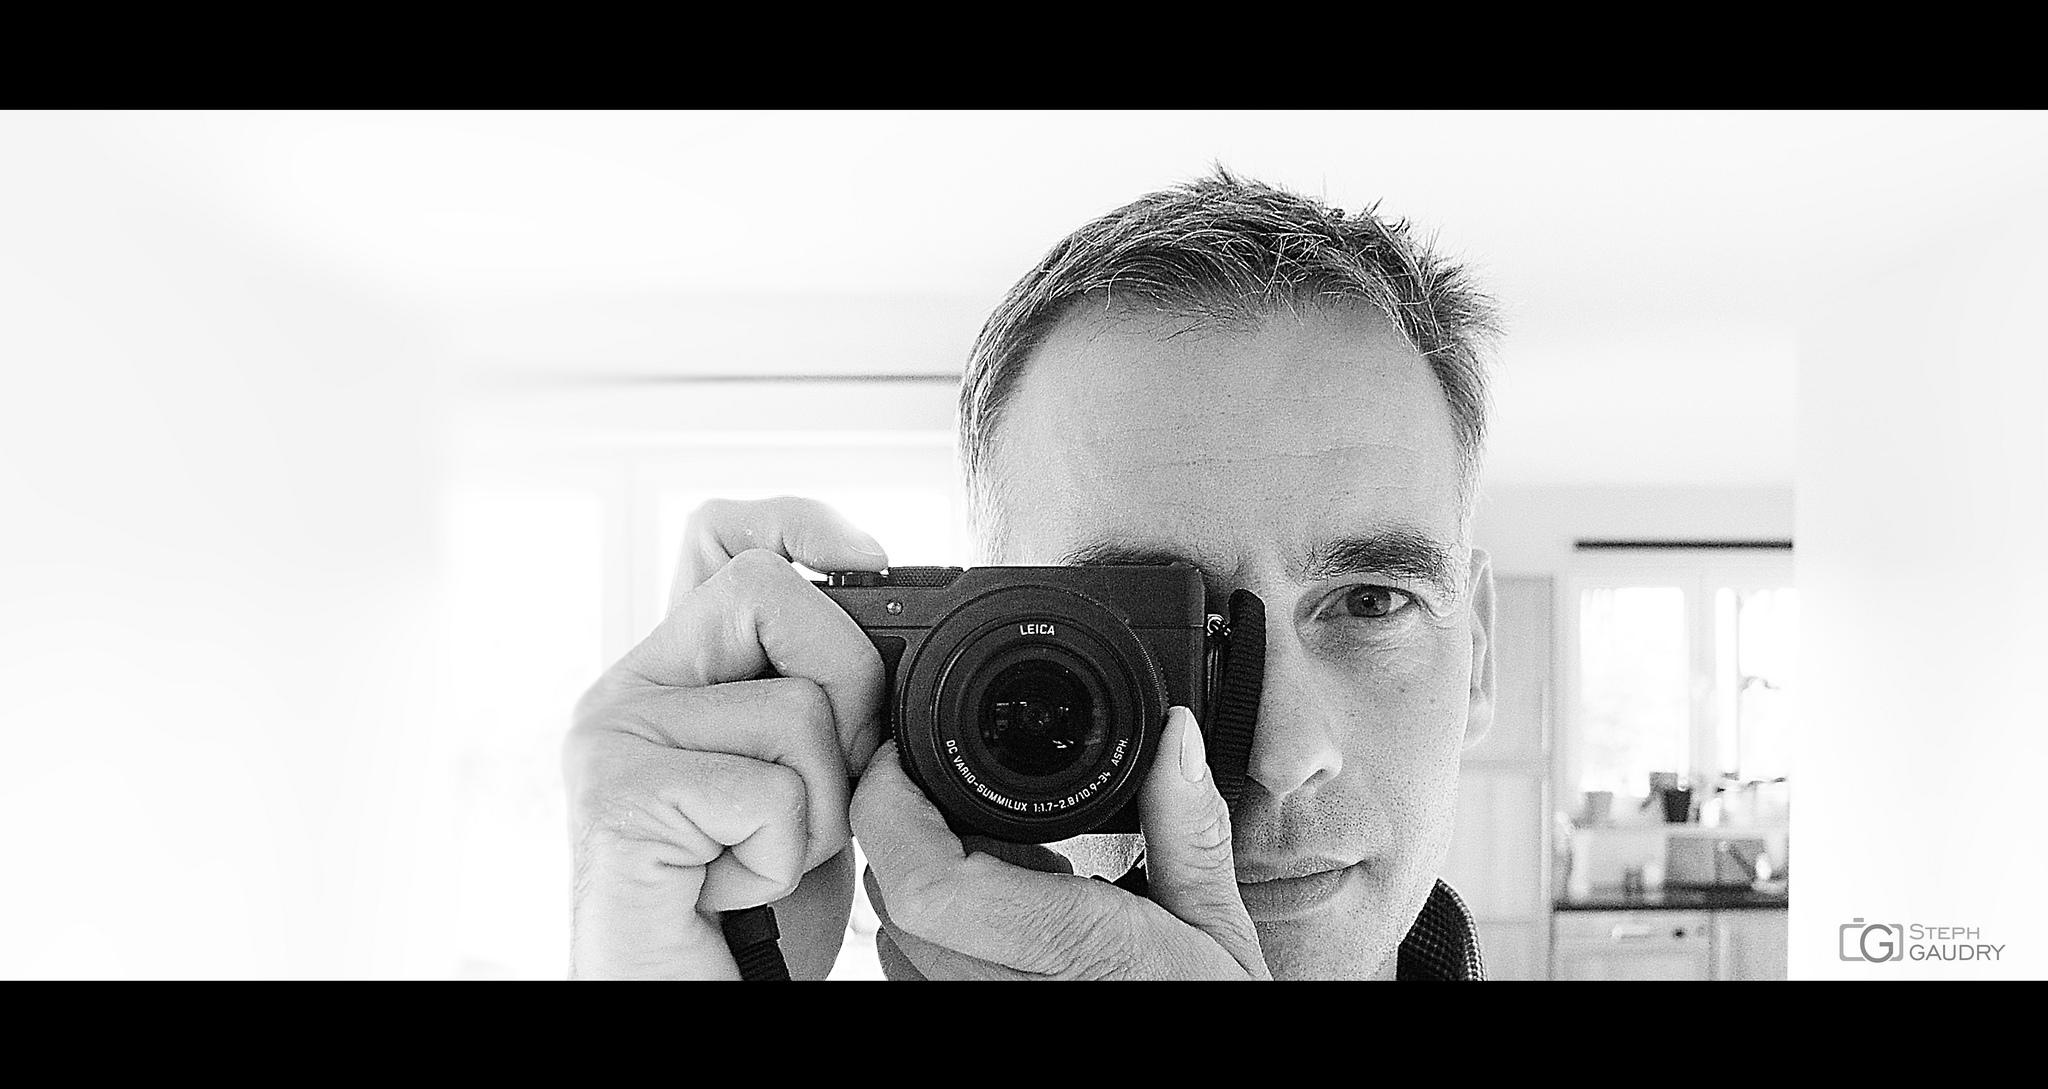 Autoportrait Lumix objectif Leica Summilux 1:1.7 24-70 [Click to start slideshow]